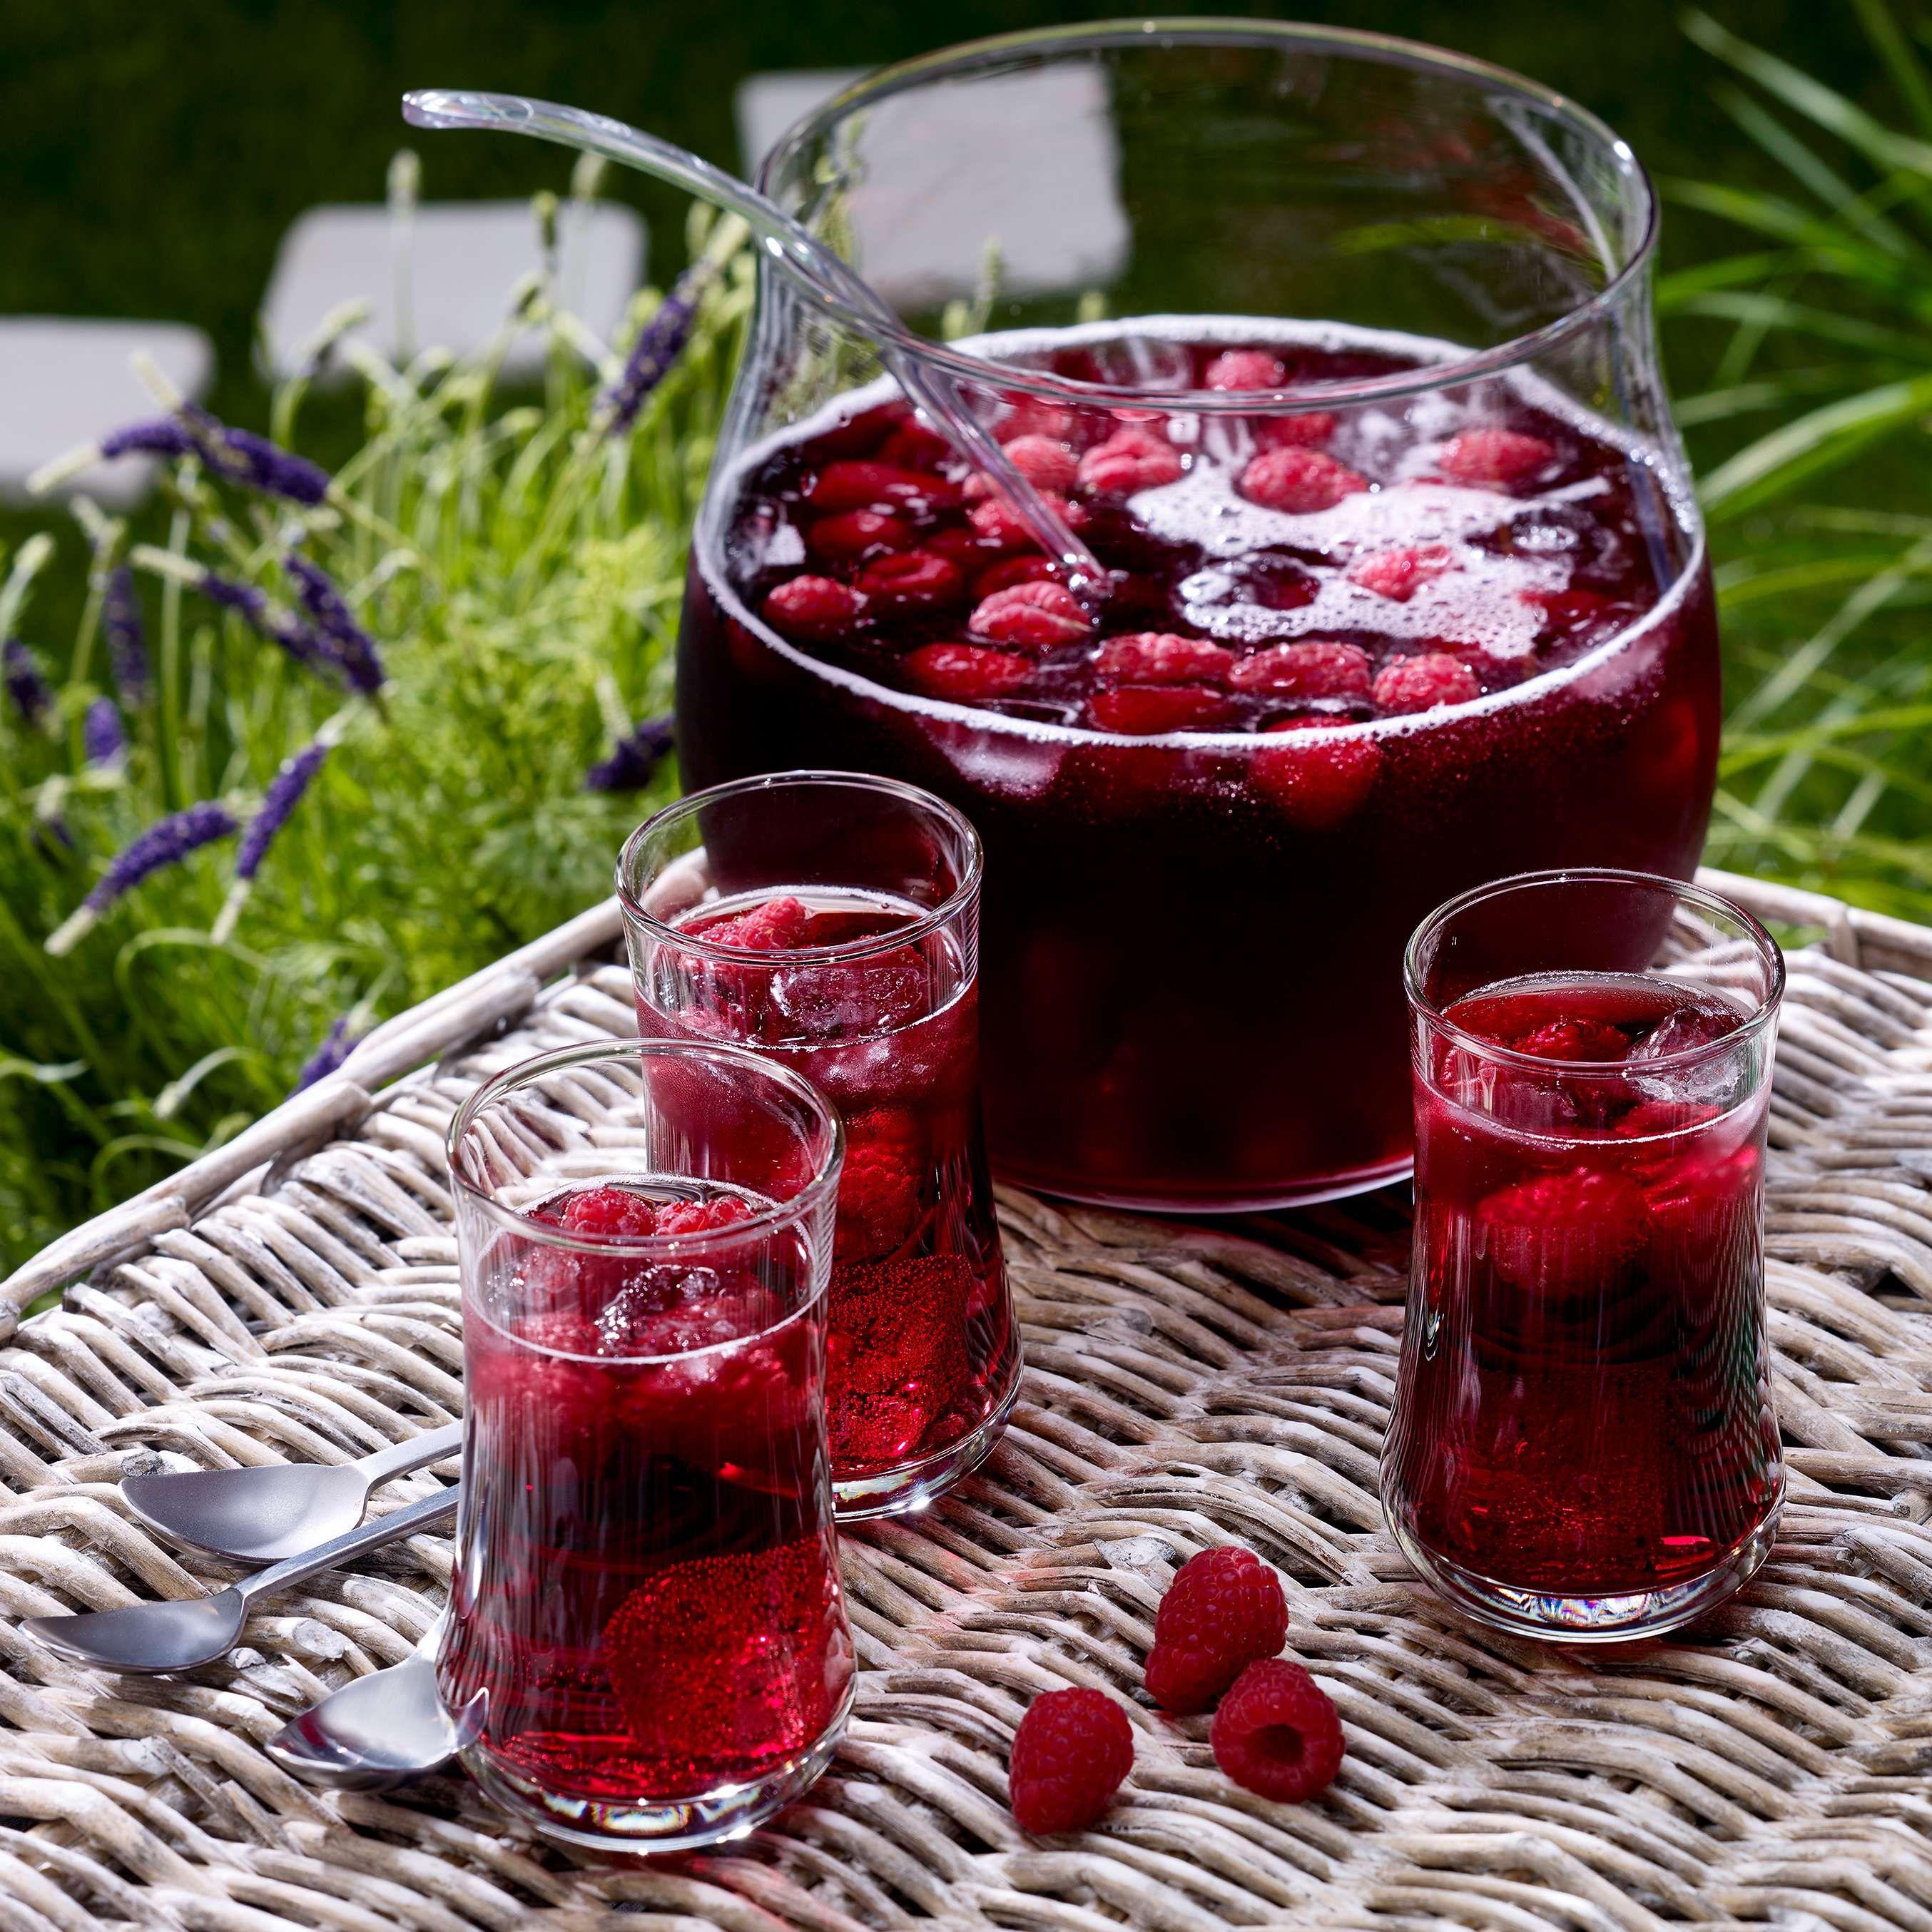 Sommerliche Beerenbowle